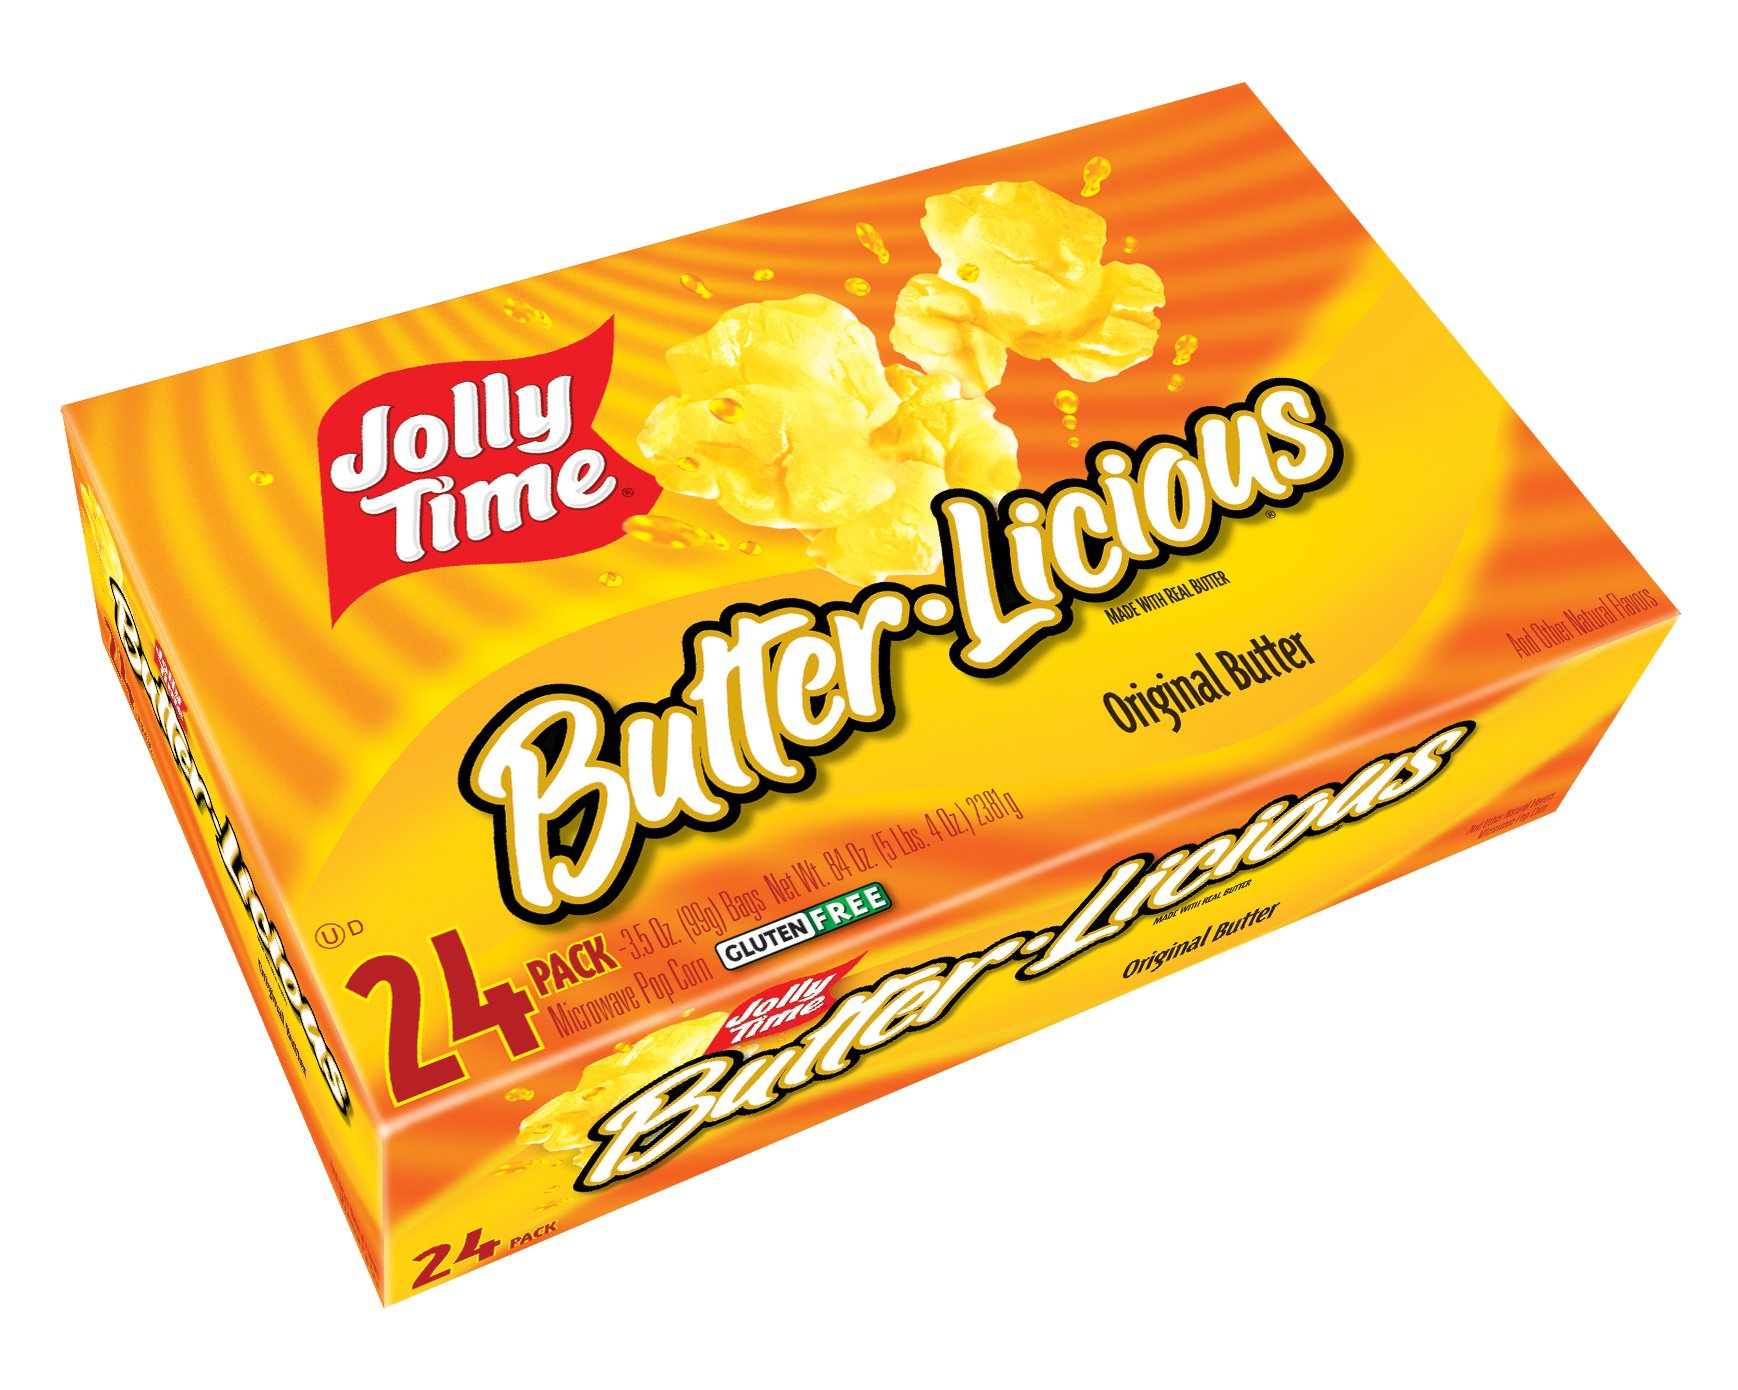 Jolly Time Butter-Licious Original Butter Microwave Popcorn Gluten-Free, Bulk 24-Count Box